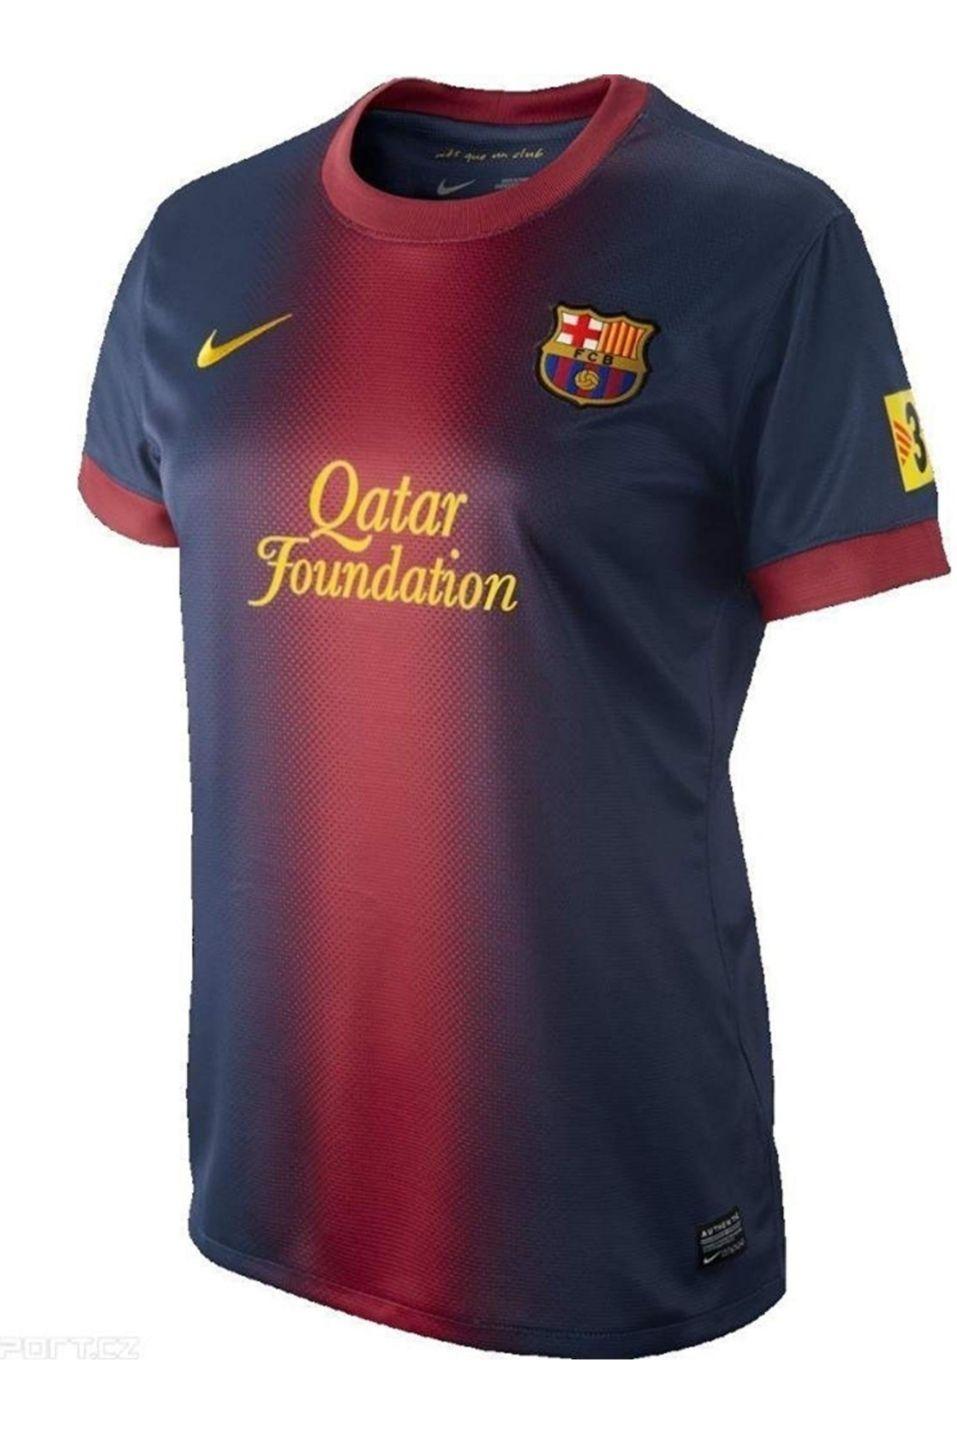 Nike. Camiseta FC Barcelona 2013